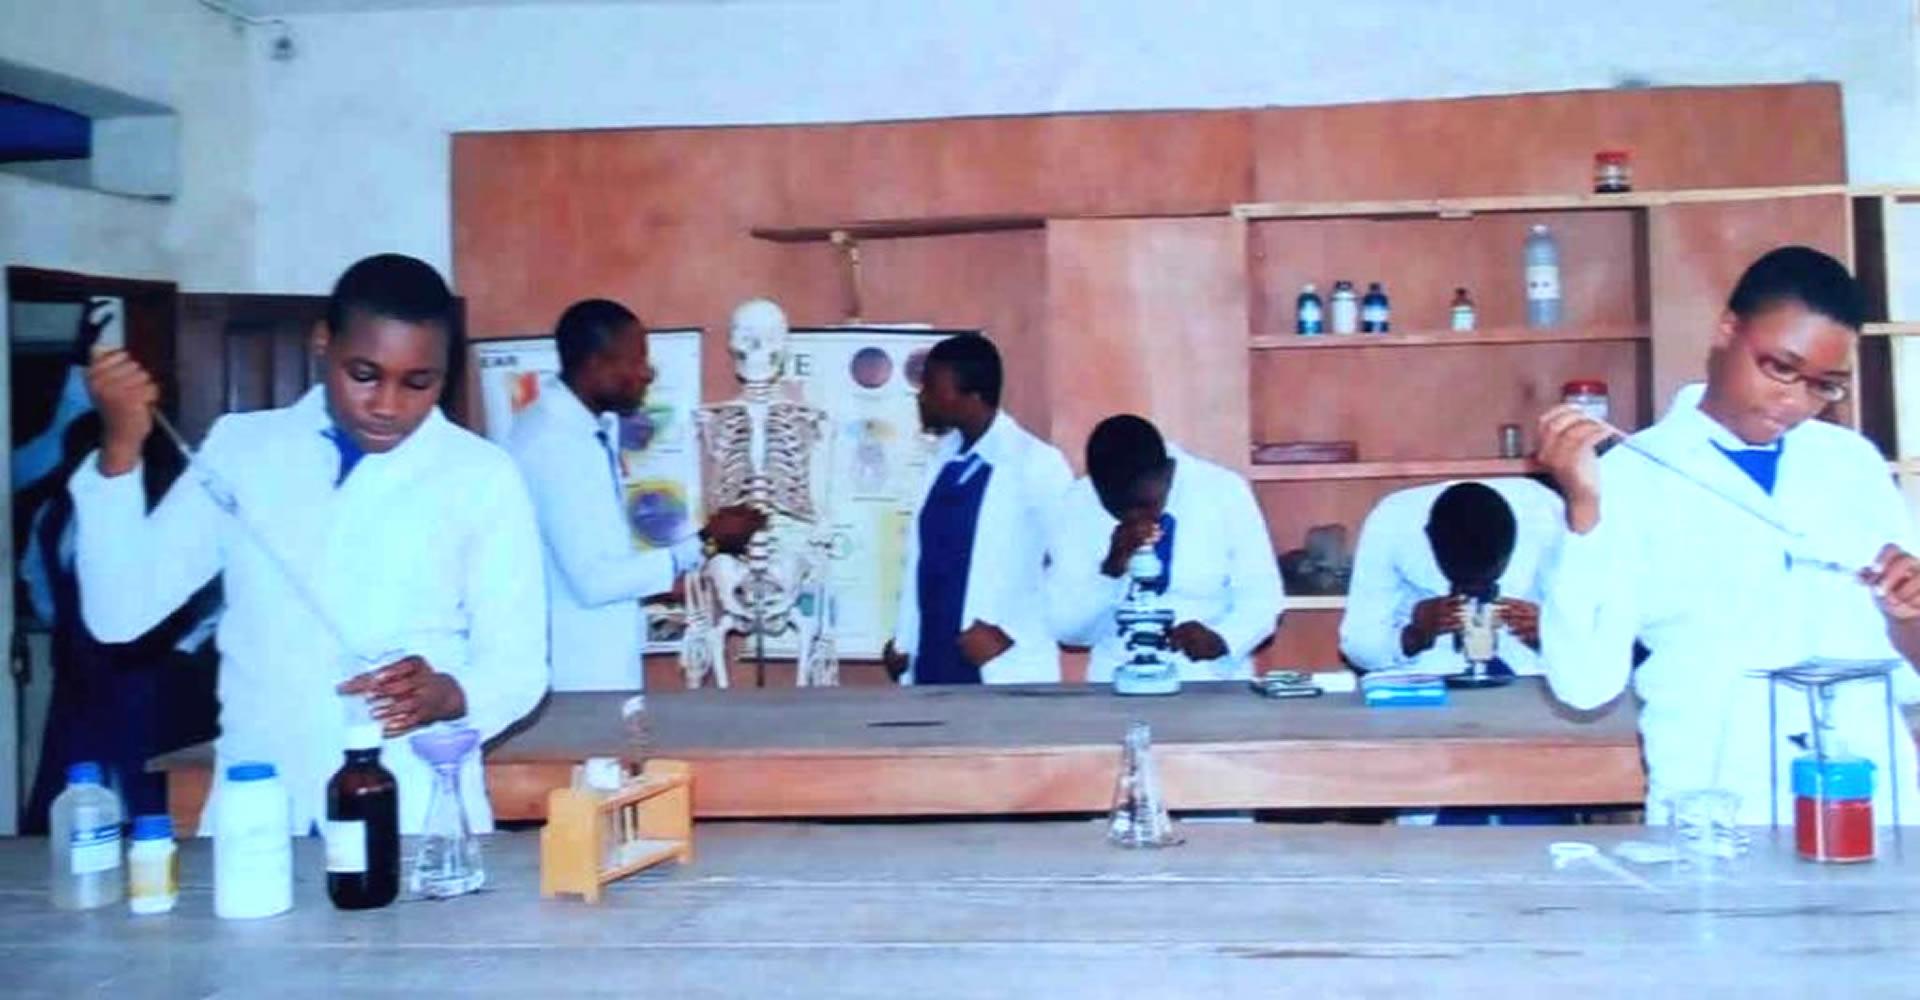 Standard laboratory facilities